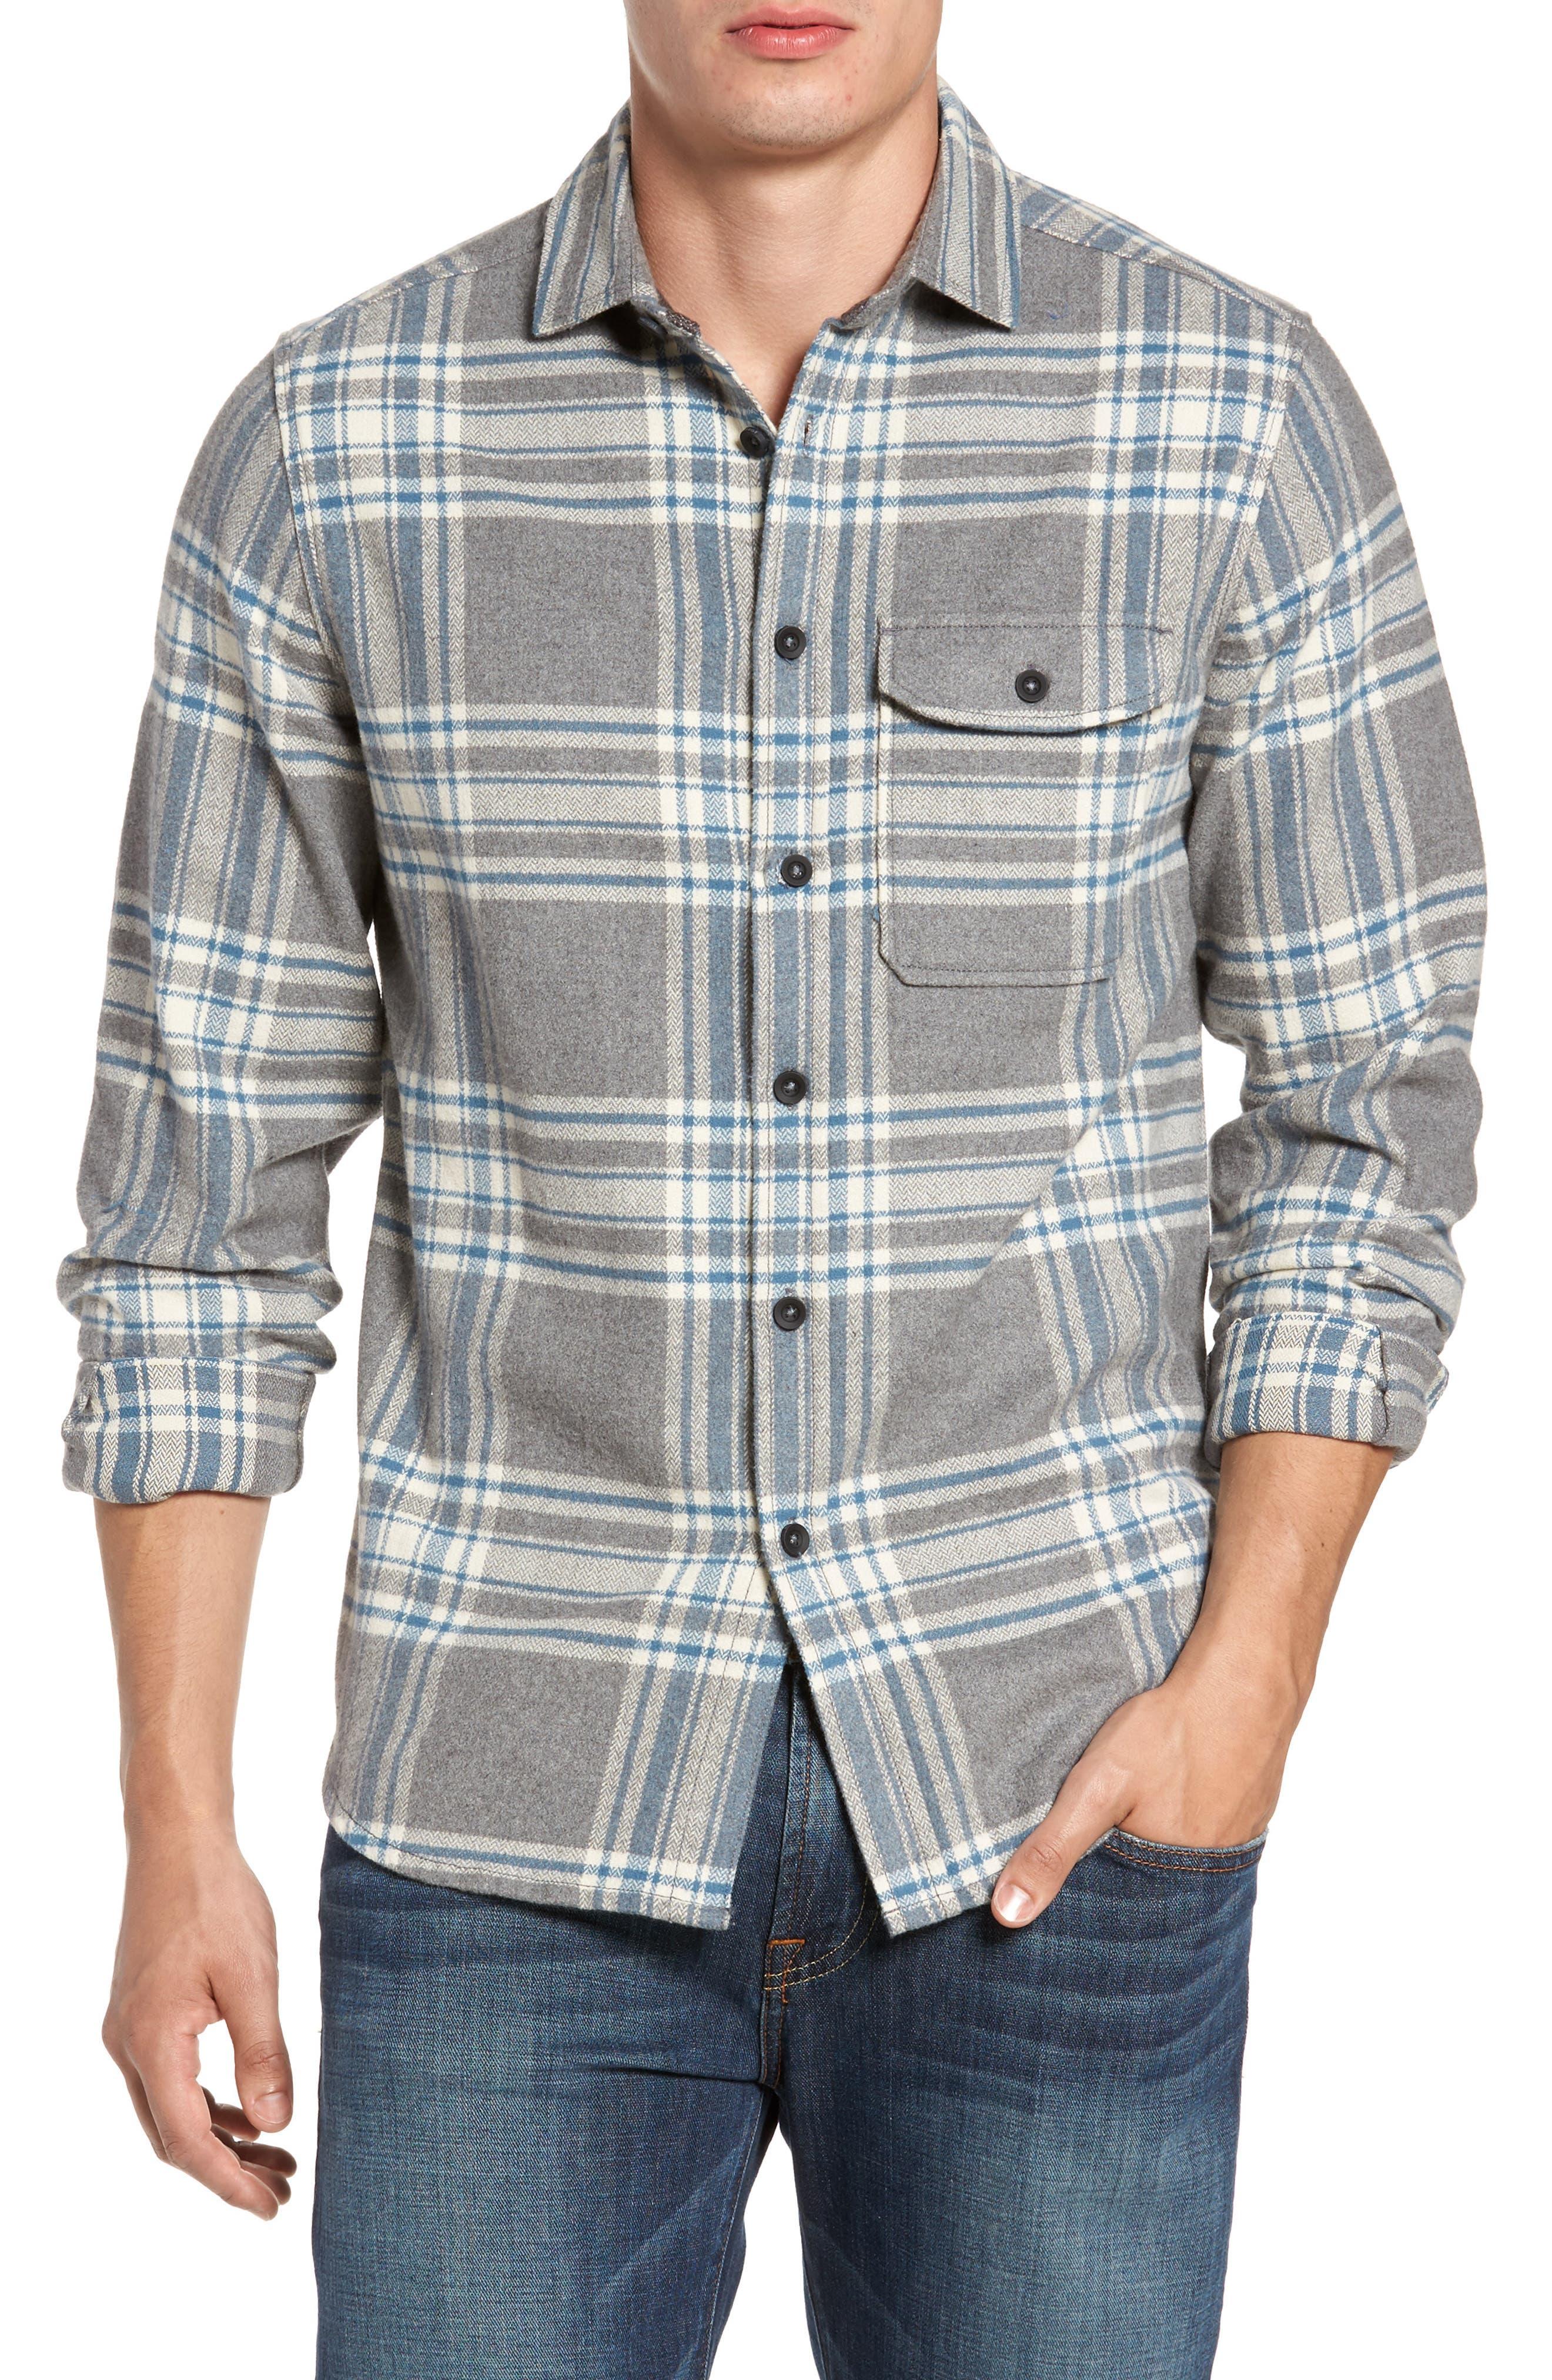 Marin Herringbone Plaid Flannel Shirt,                         Main,                         color, Smoked Pearl Heather